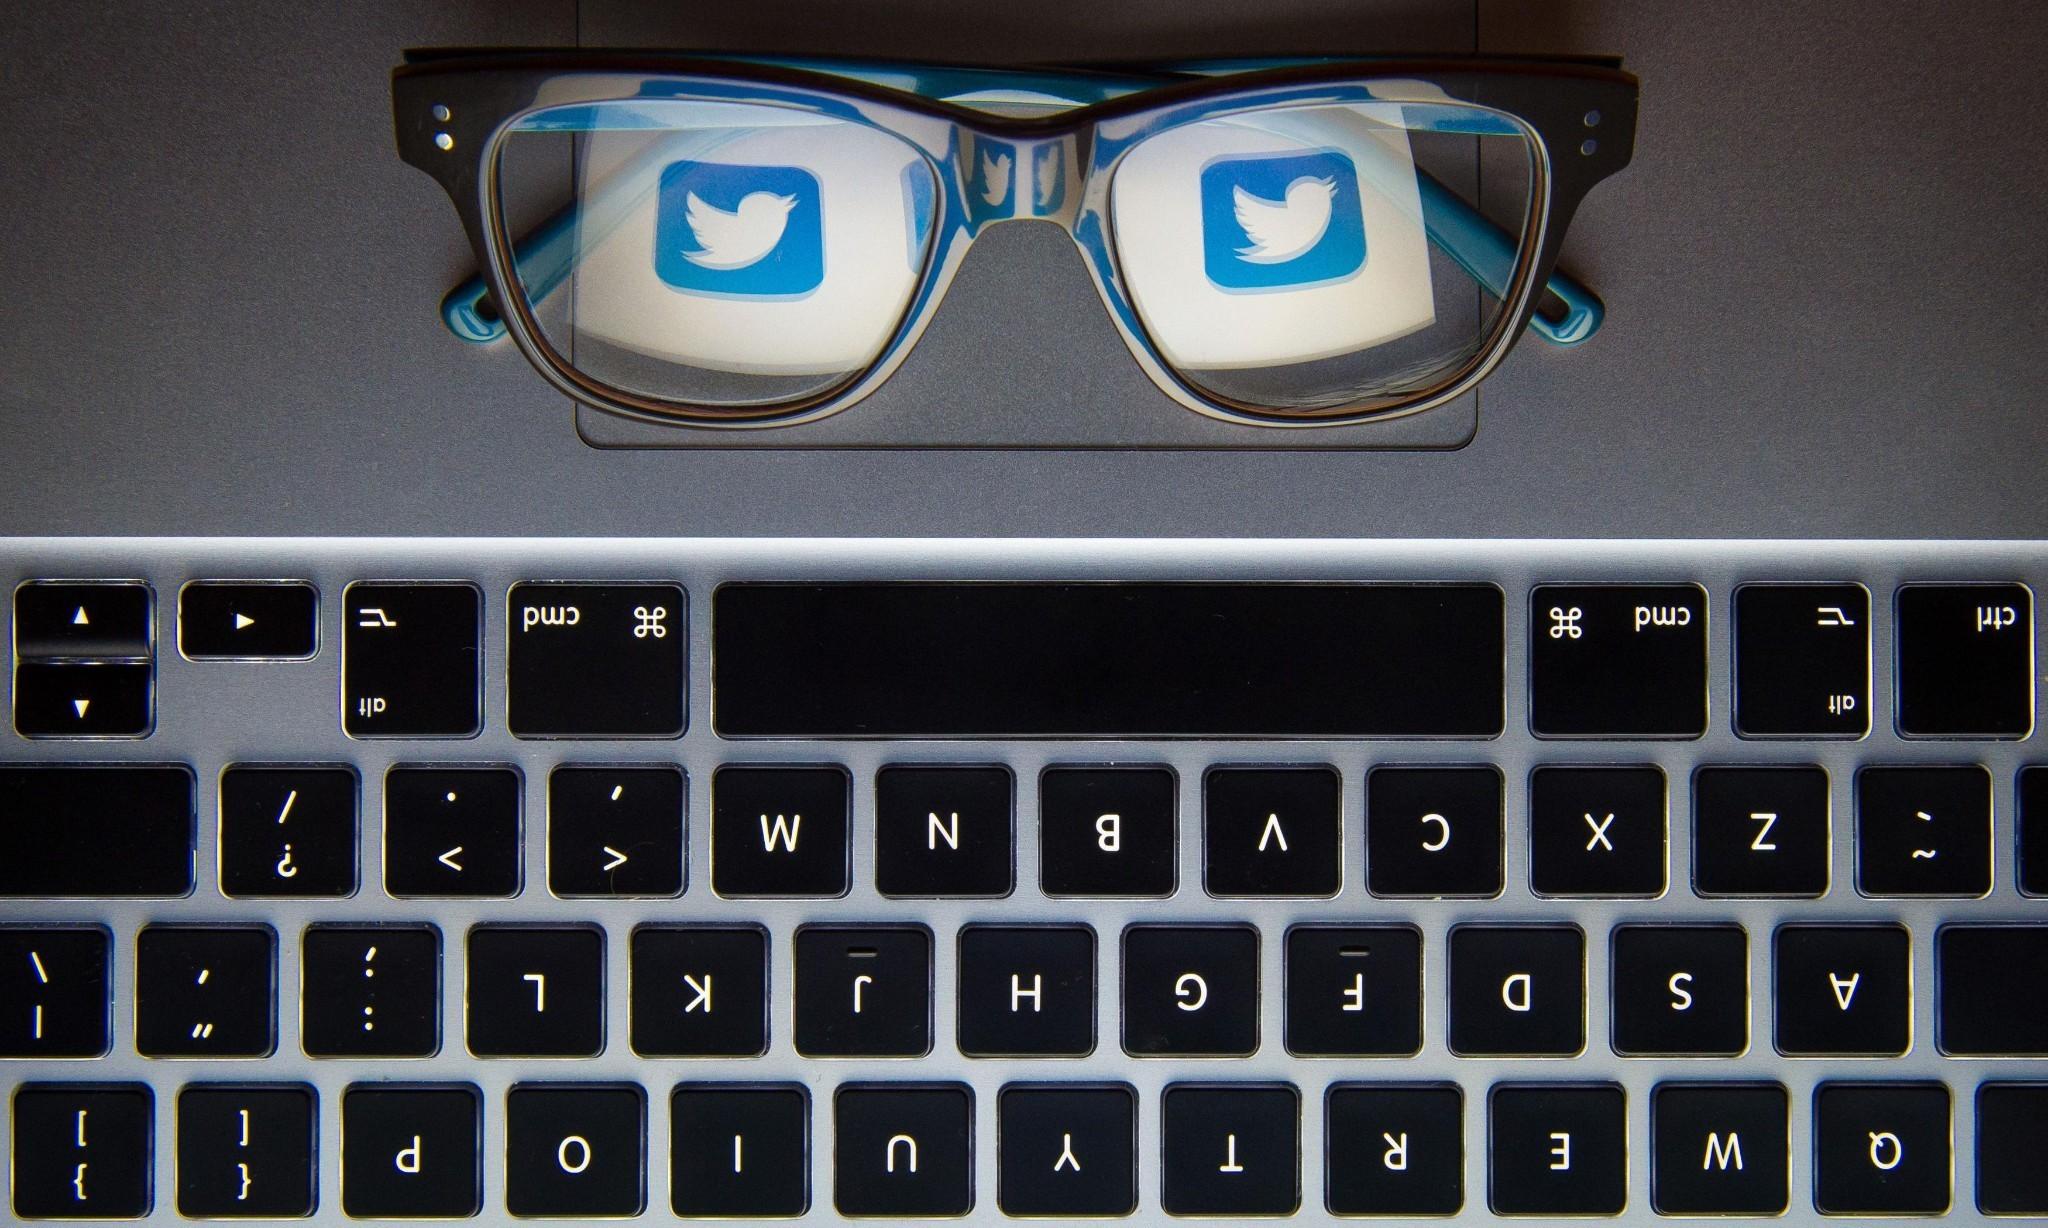 Twitter unveils revised rules regarding hate speech in posts